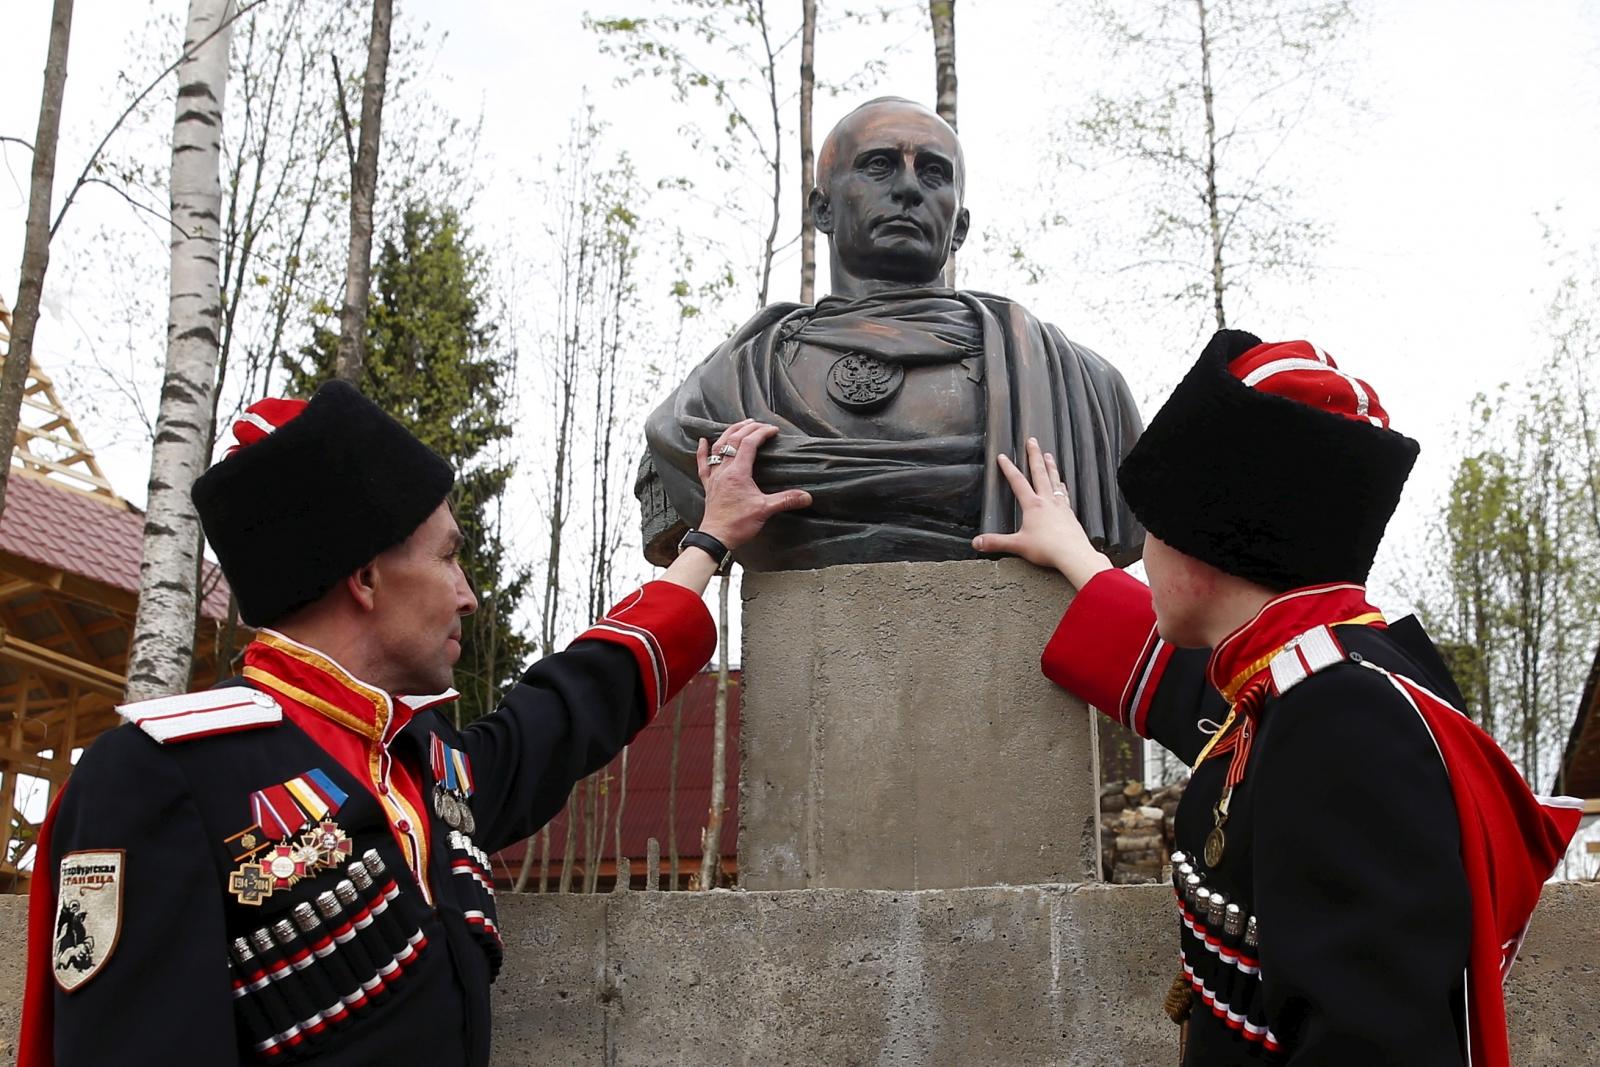 Cossacks with the Caeser bust of Putin